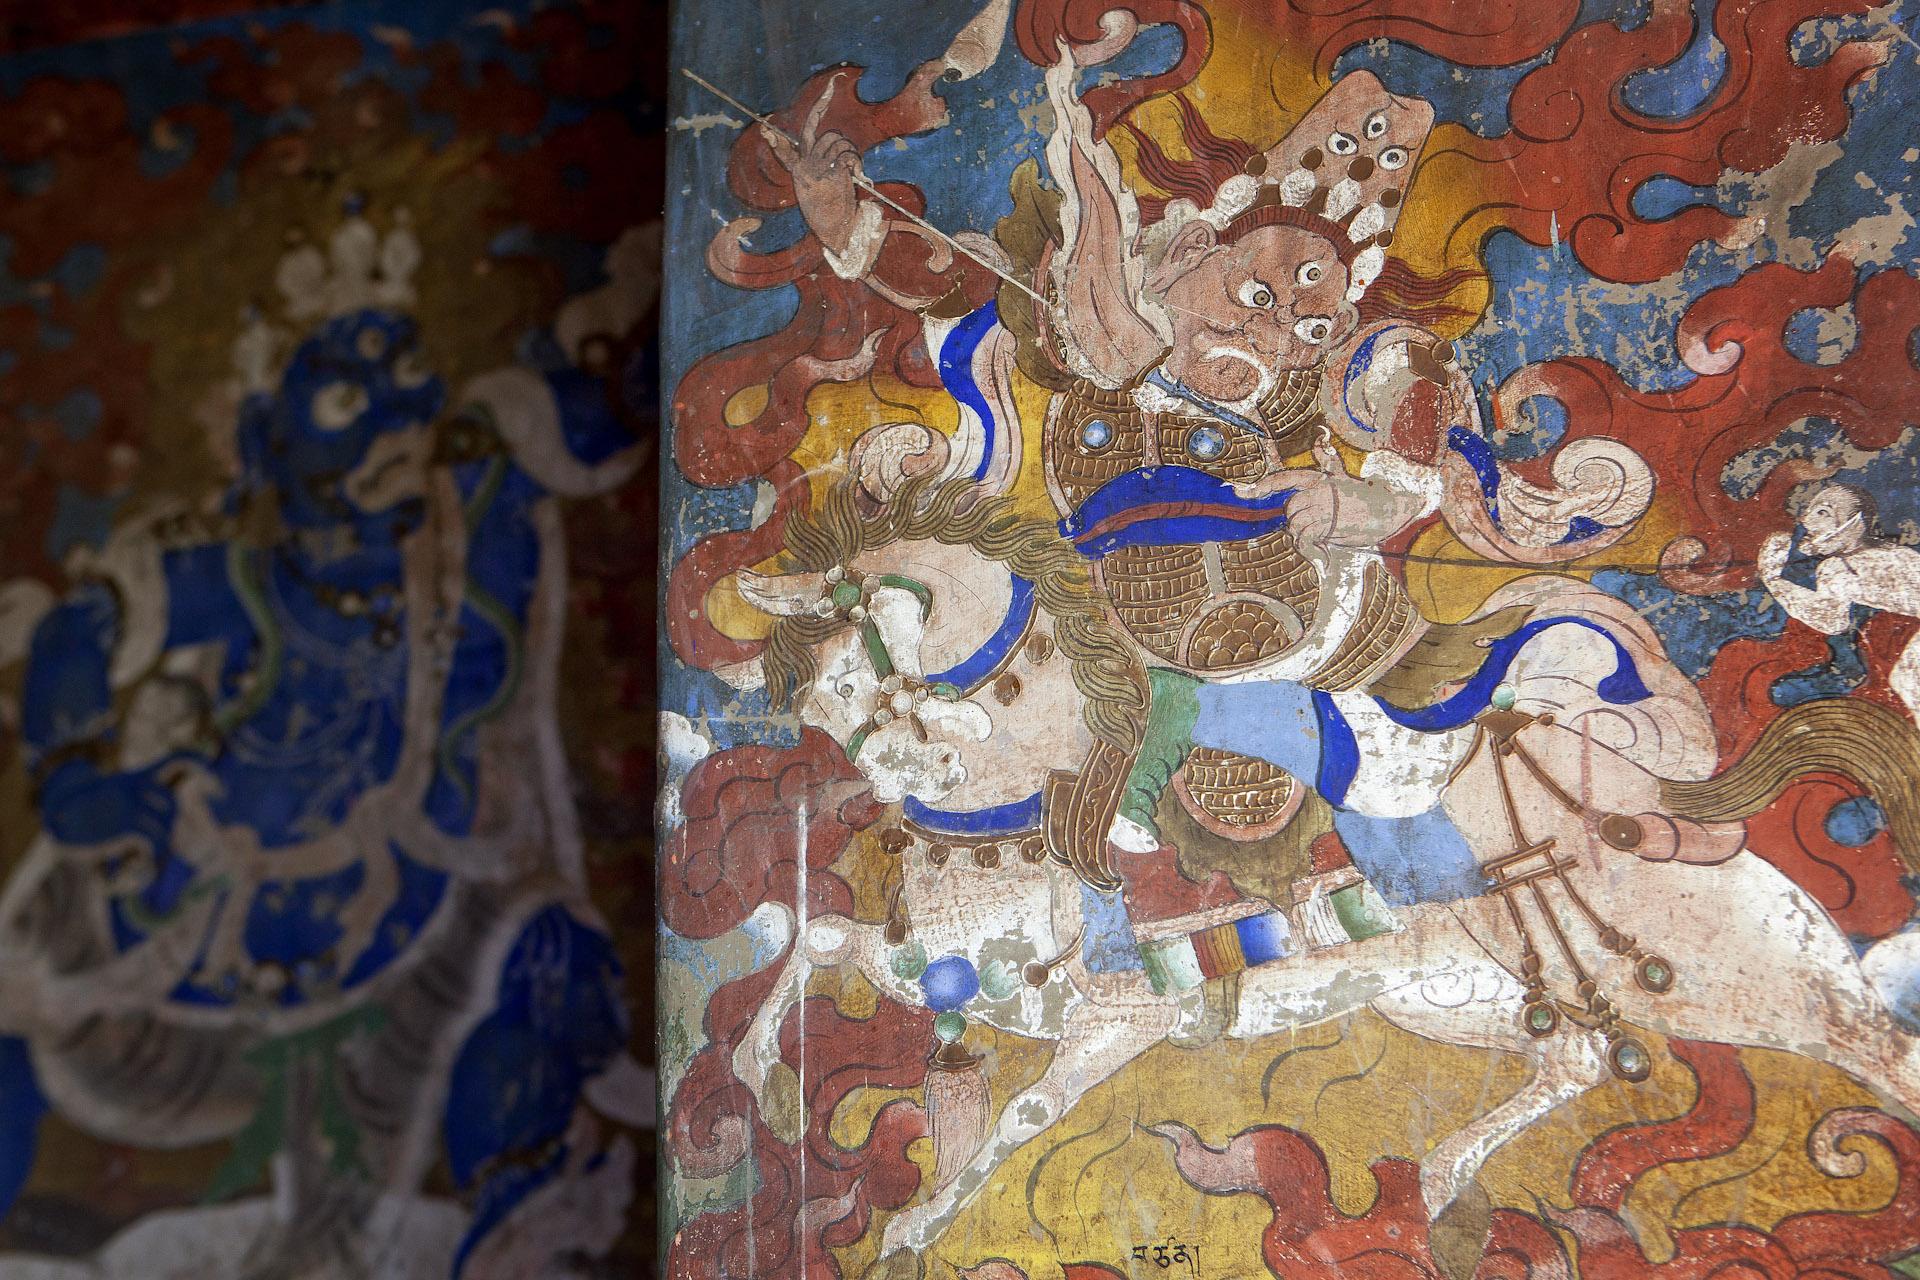 India-Sikkim-Travel-Dubdi-Monastery-Mural.JPG